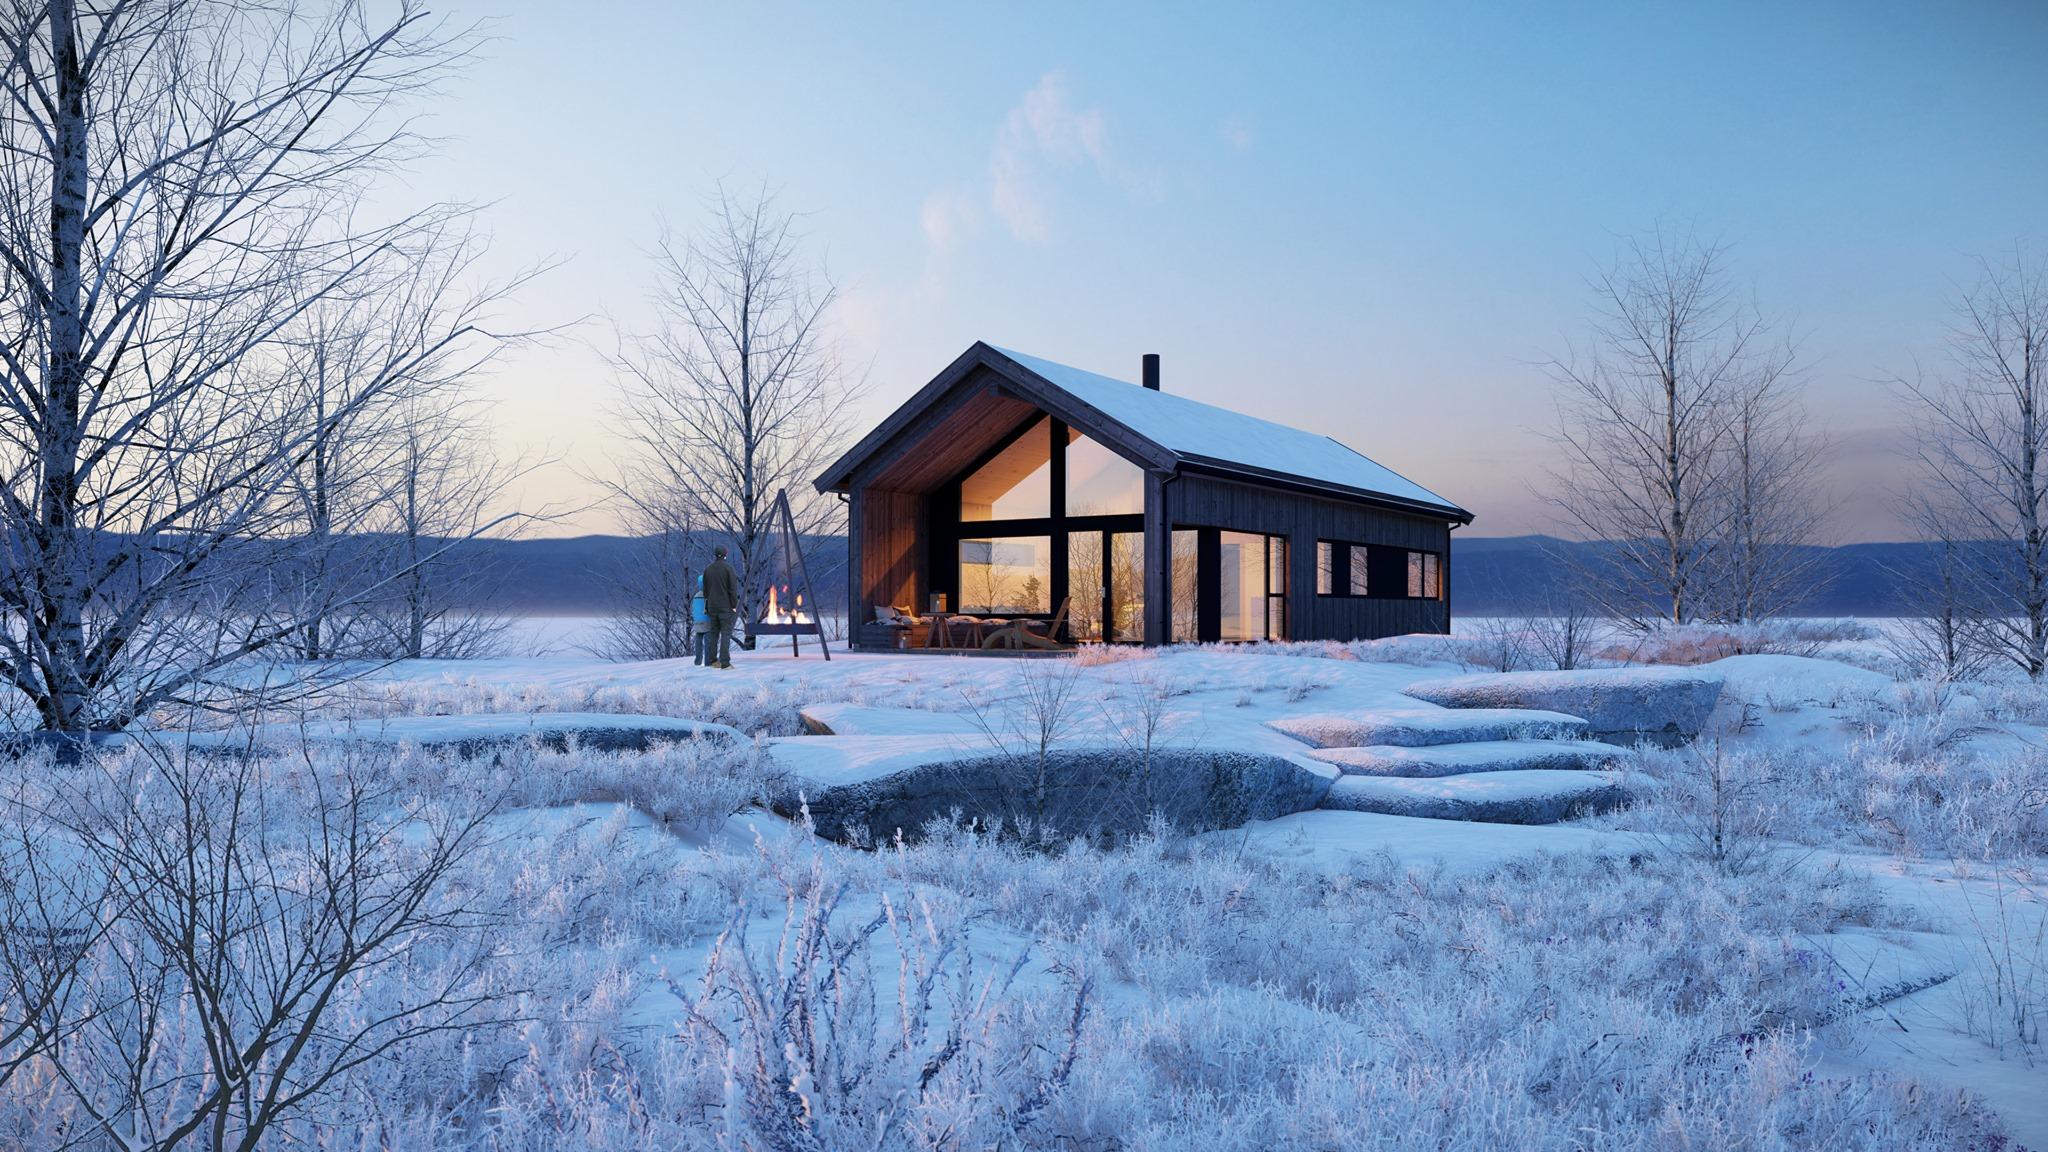 Winter cabin in Norway, rendered in Lumion 11 by Bartosz Orliński and designed by Vårdal Arkitekter AS).